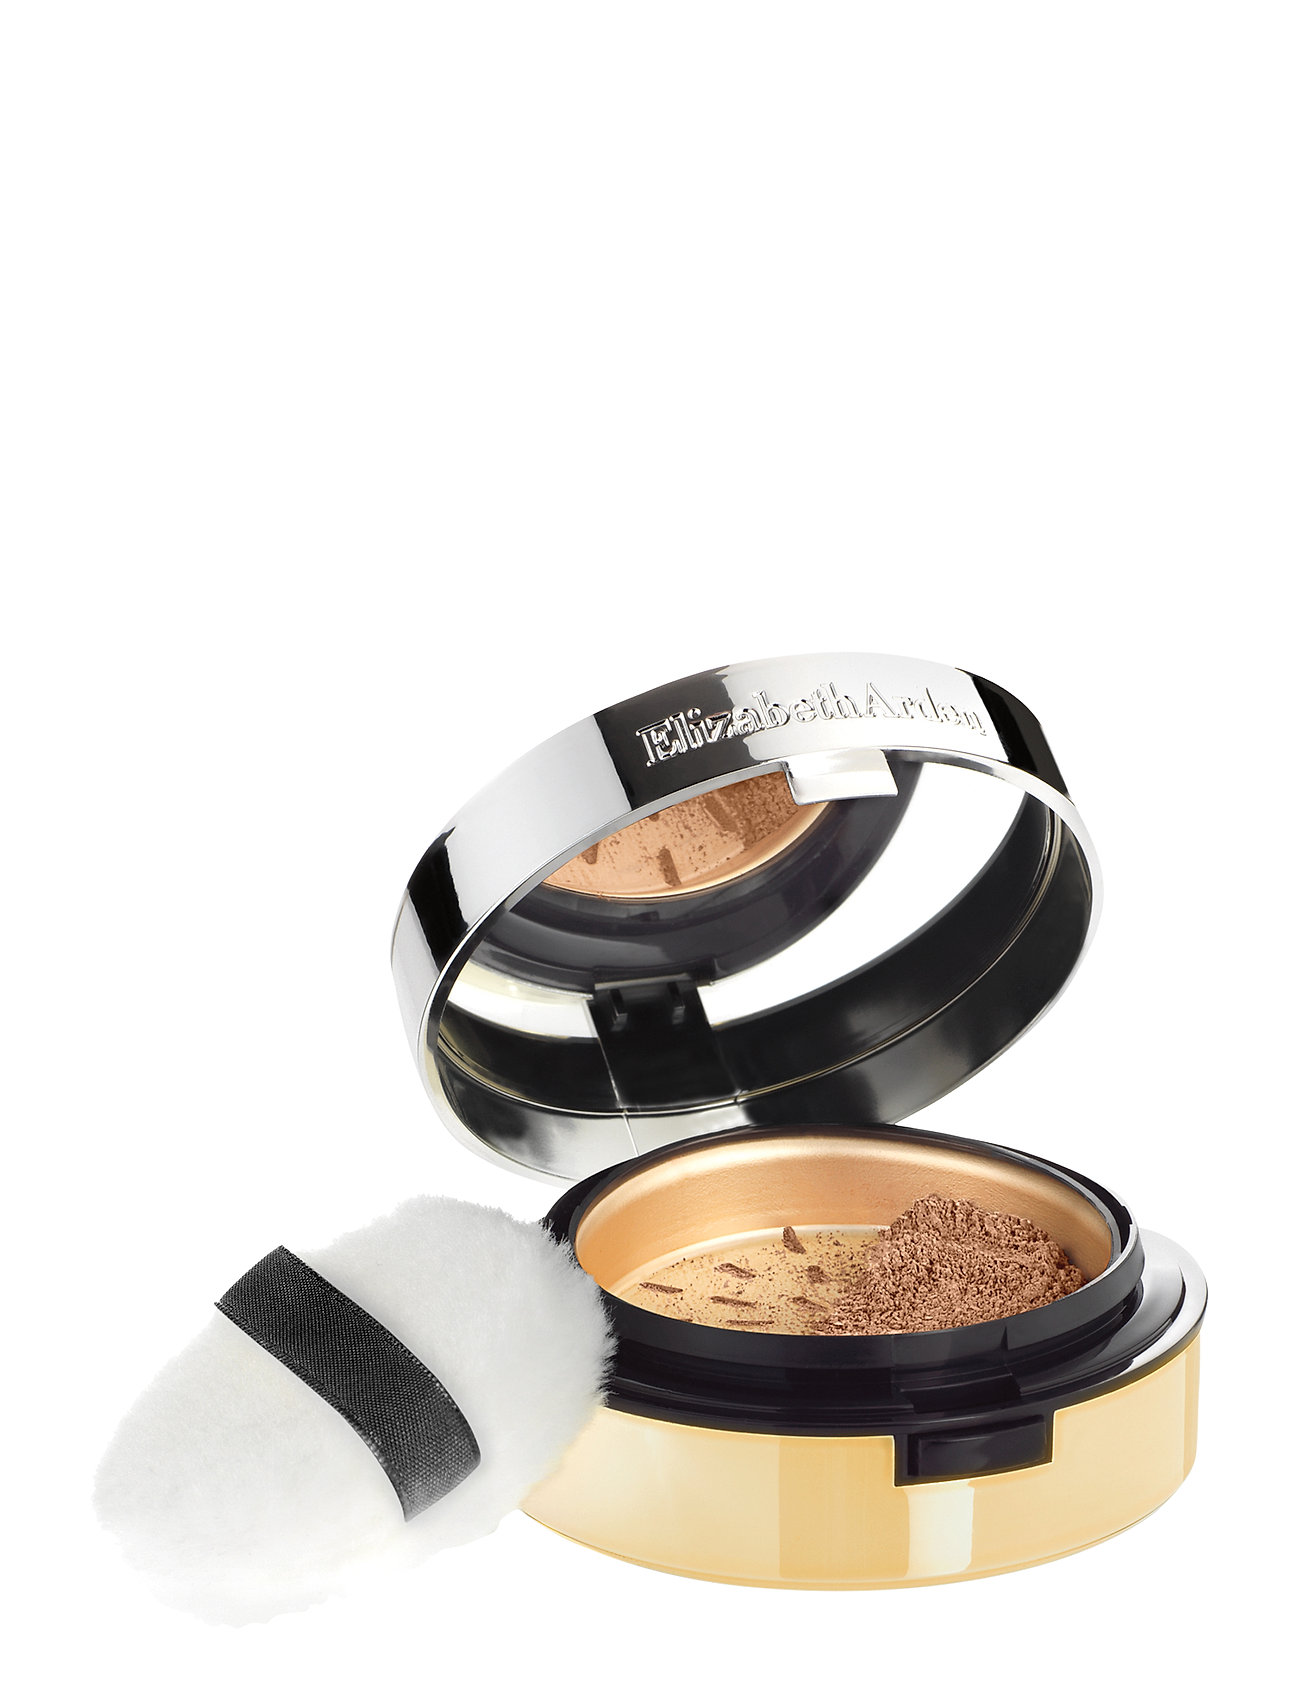 Image of Pure Finish Mineralfoundation 5 Pure Finish Pudder Makeup ELIZABETH ARDEN (3067500619)